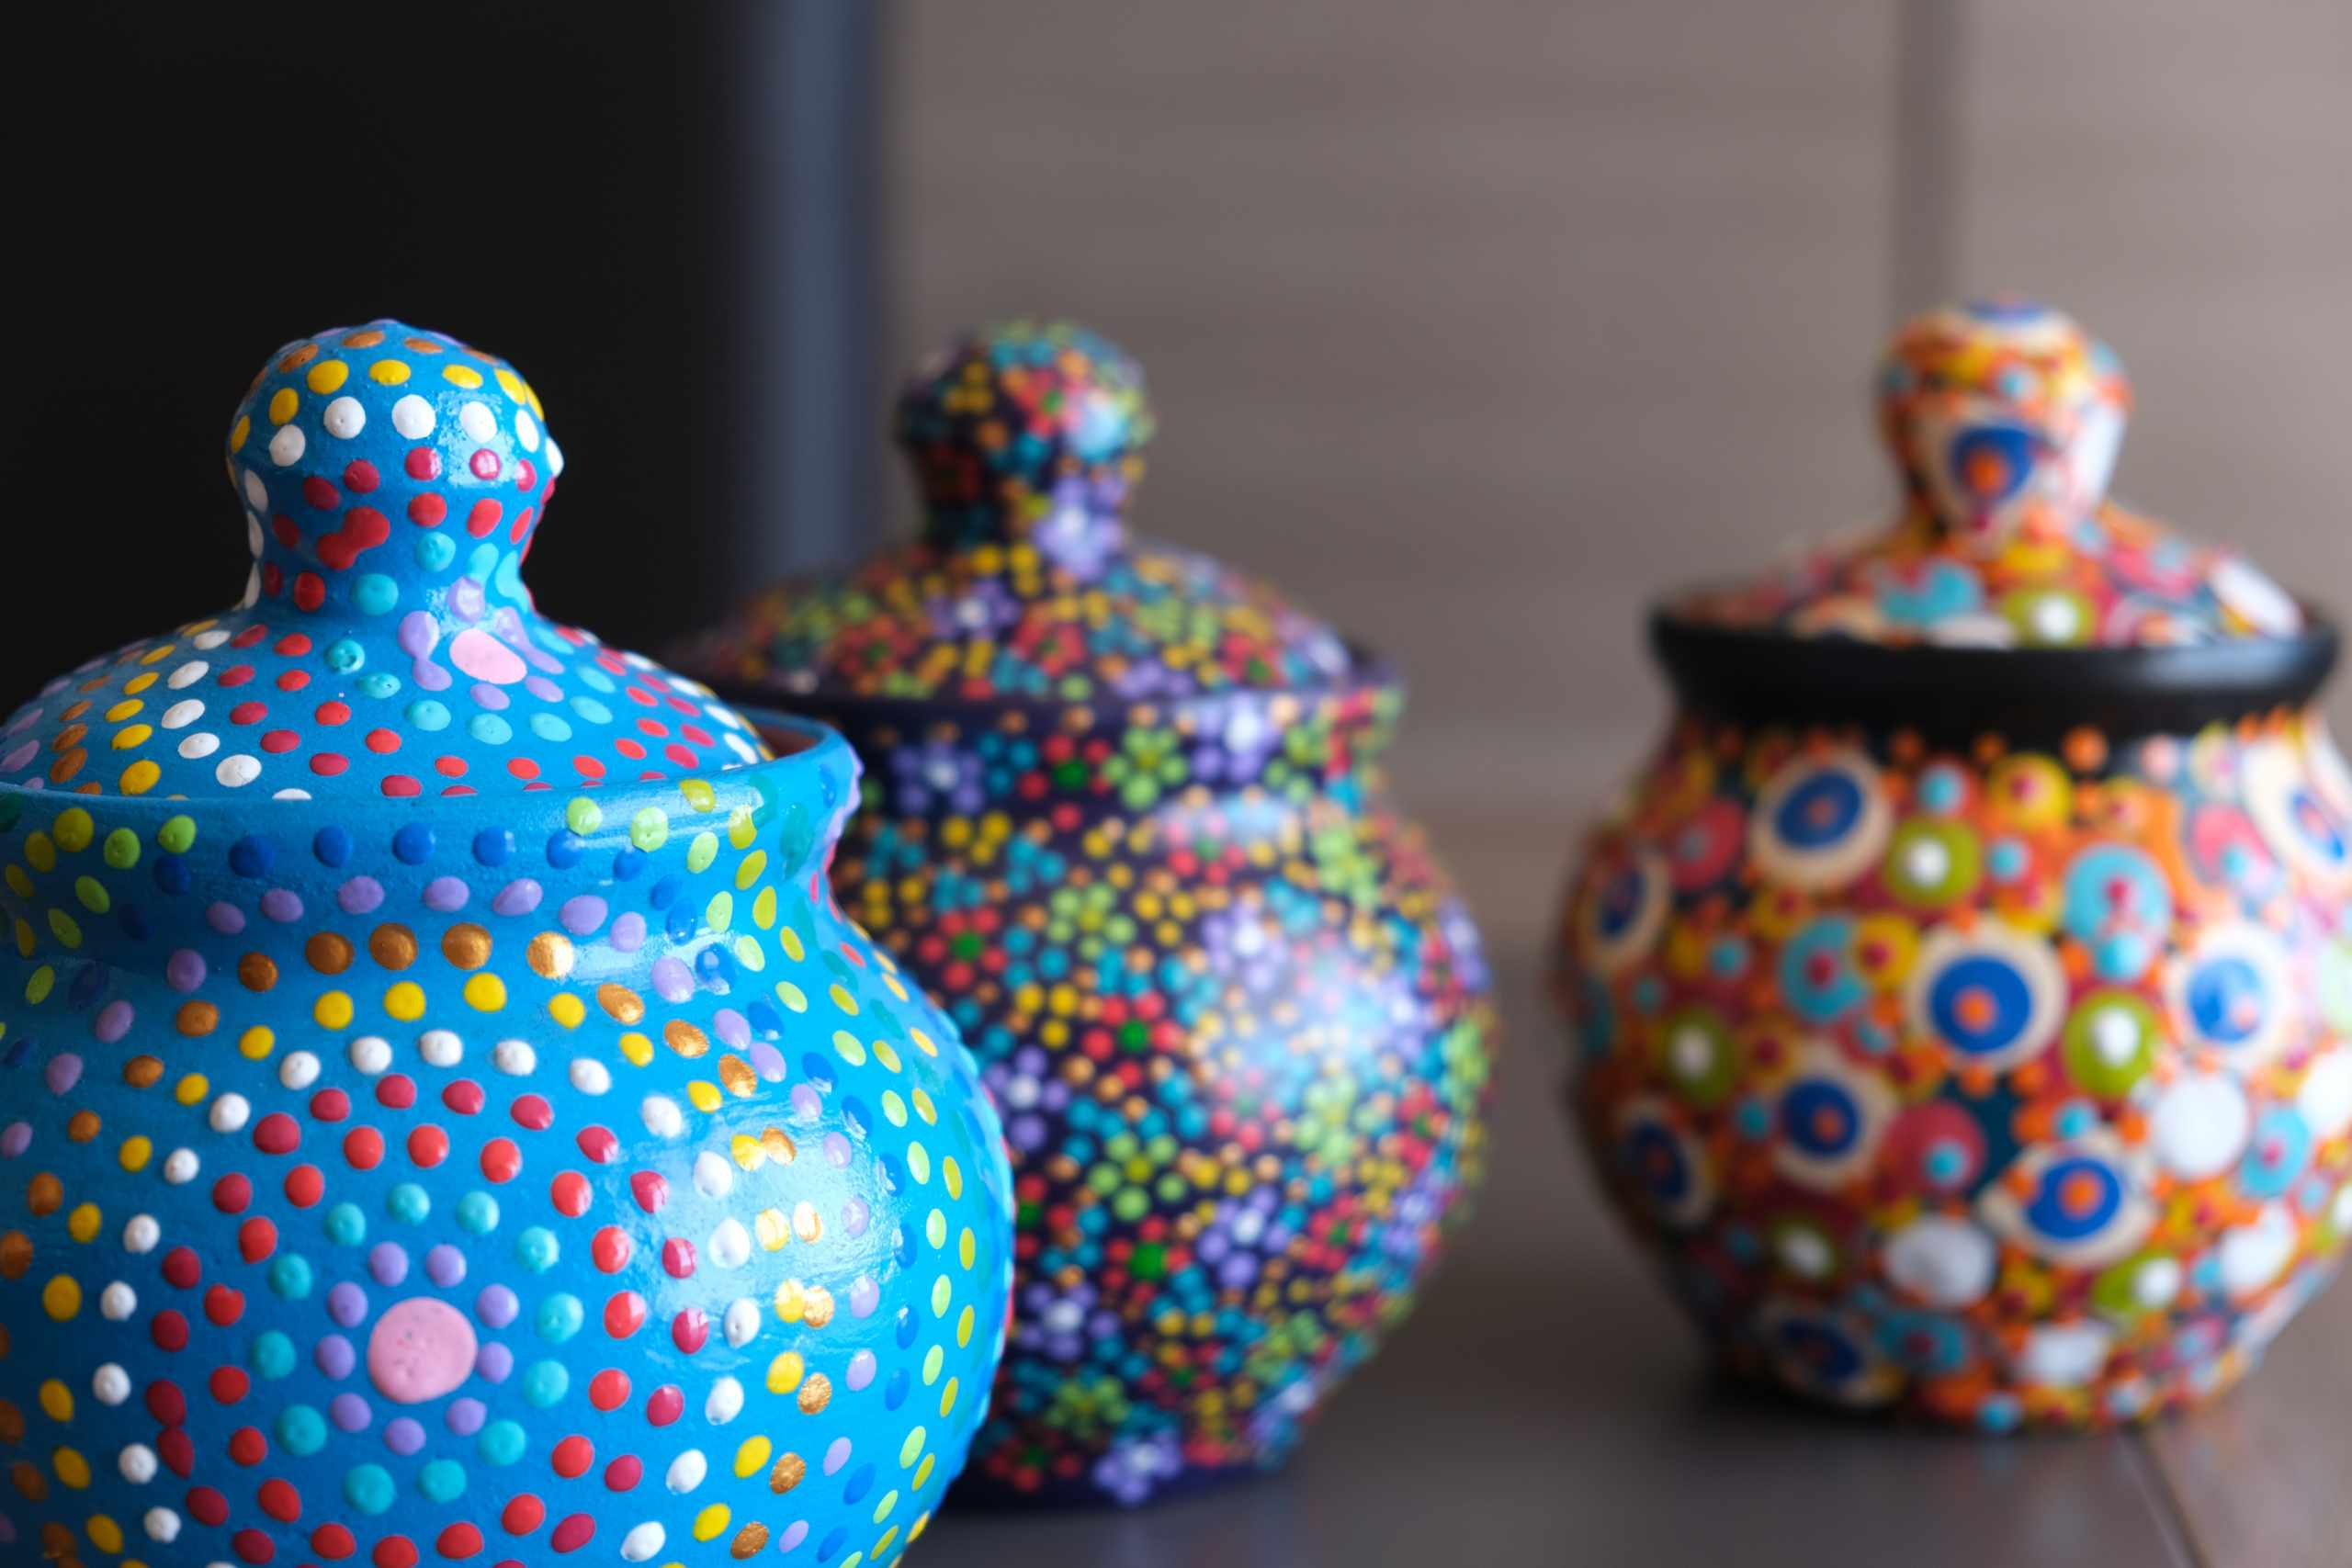 How To Choose Reliable Keepsake Memorial Urns